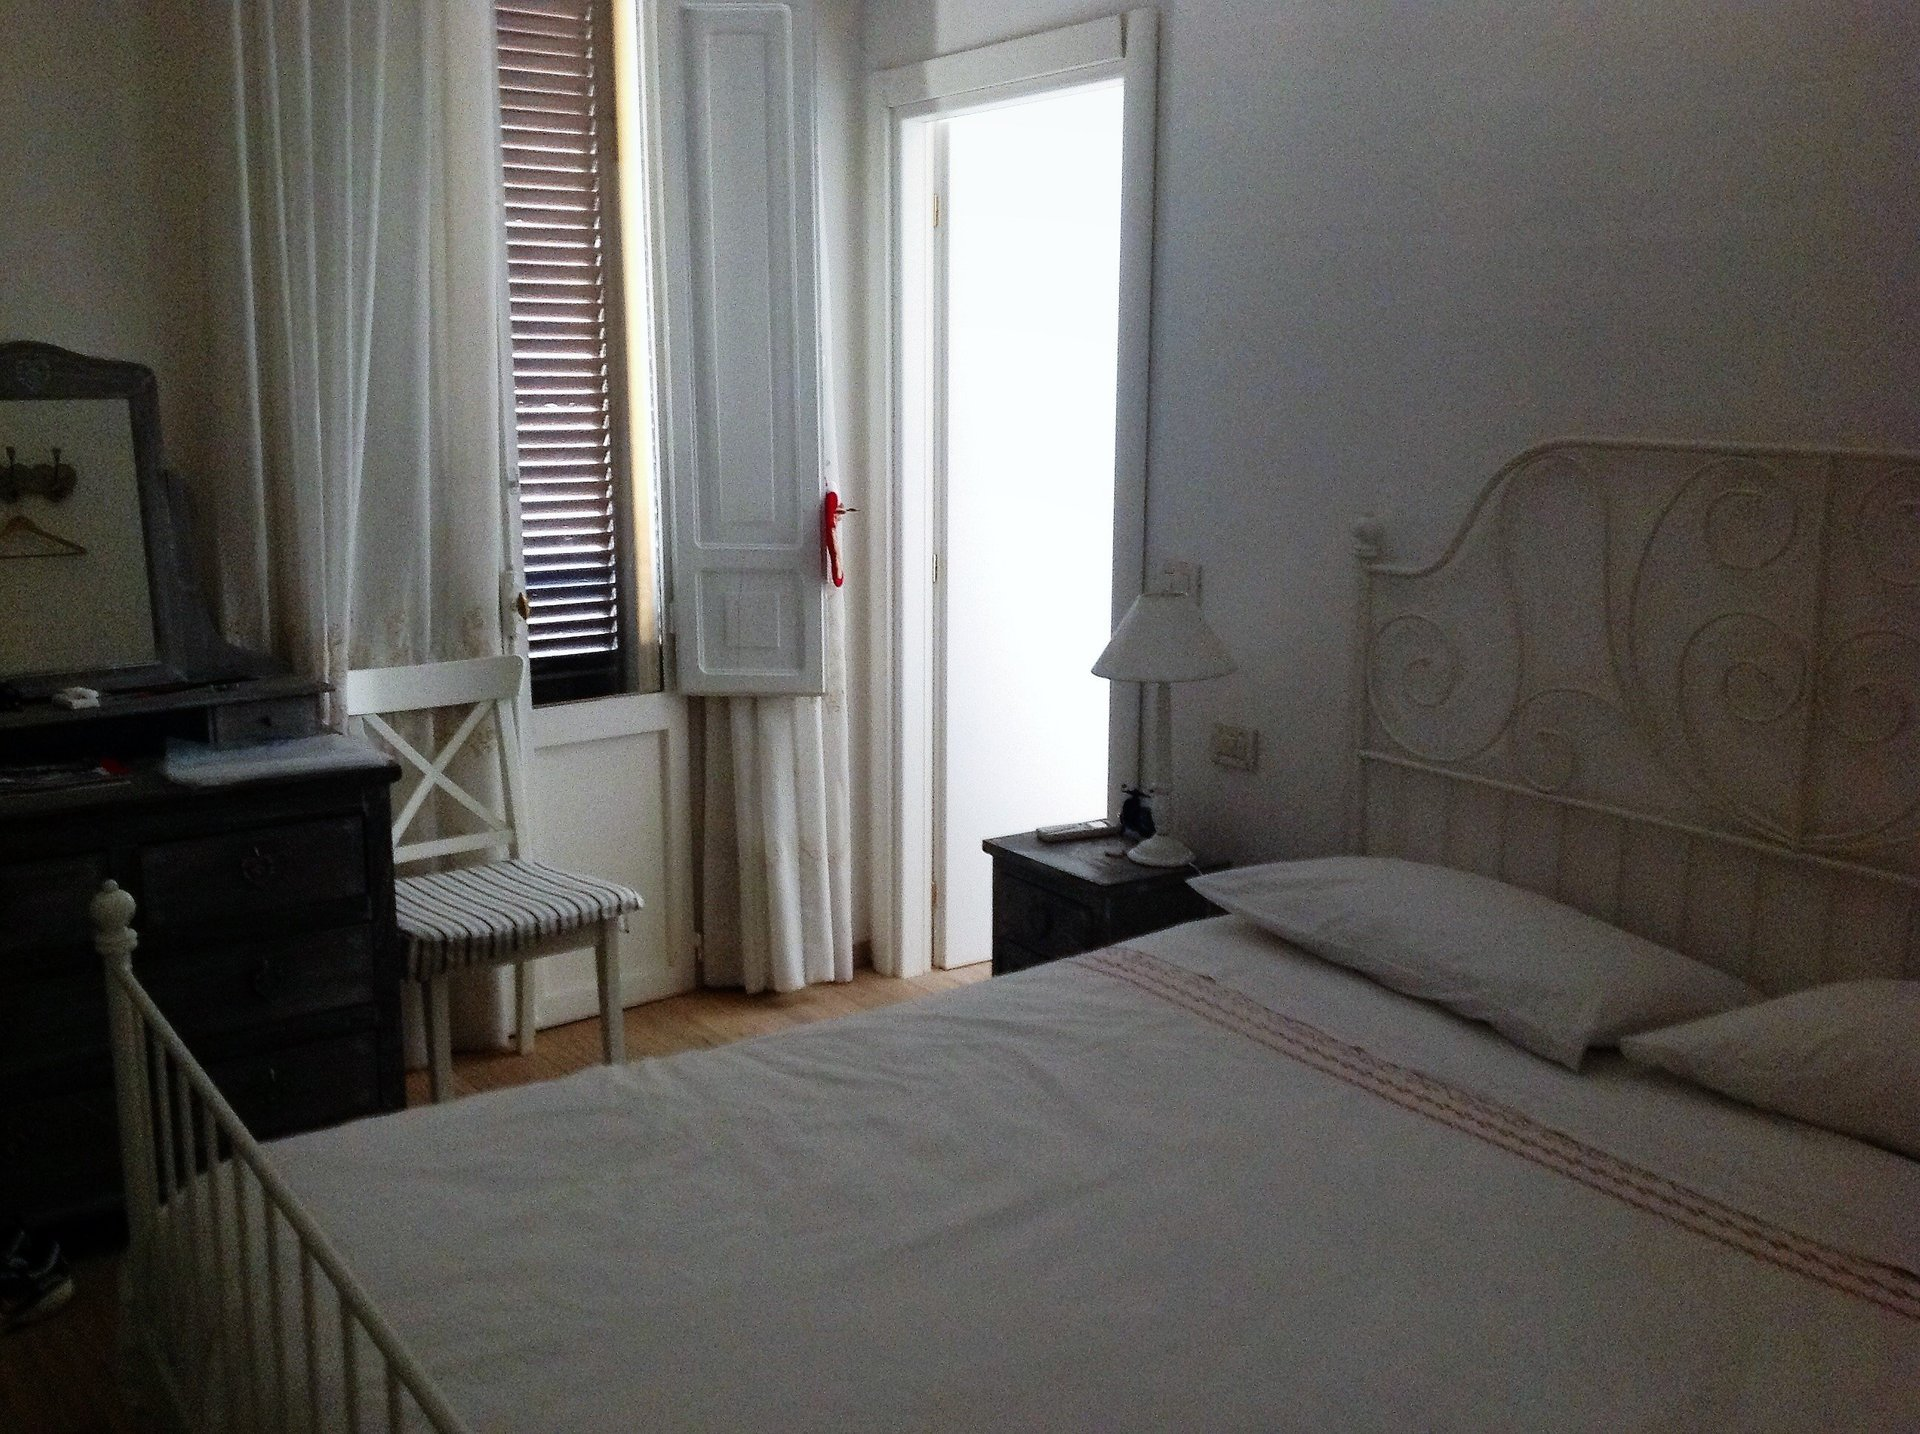 Letto Matrimoniale A Bologna.Short And Long Stay Vacations Bologna Residence Porta Saragozza